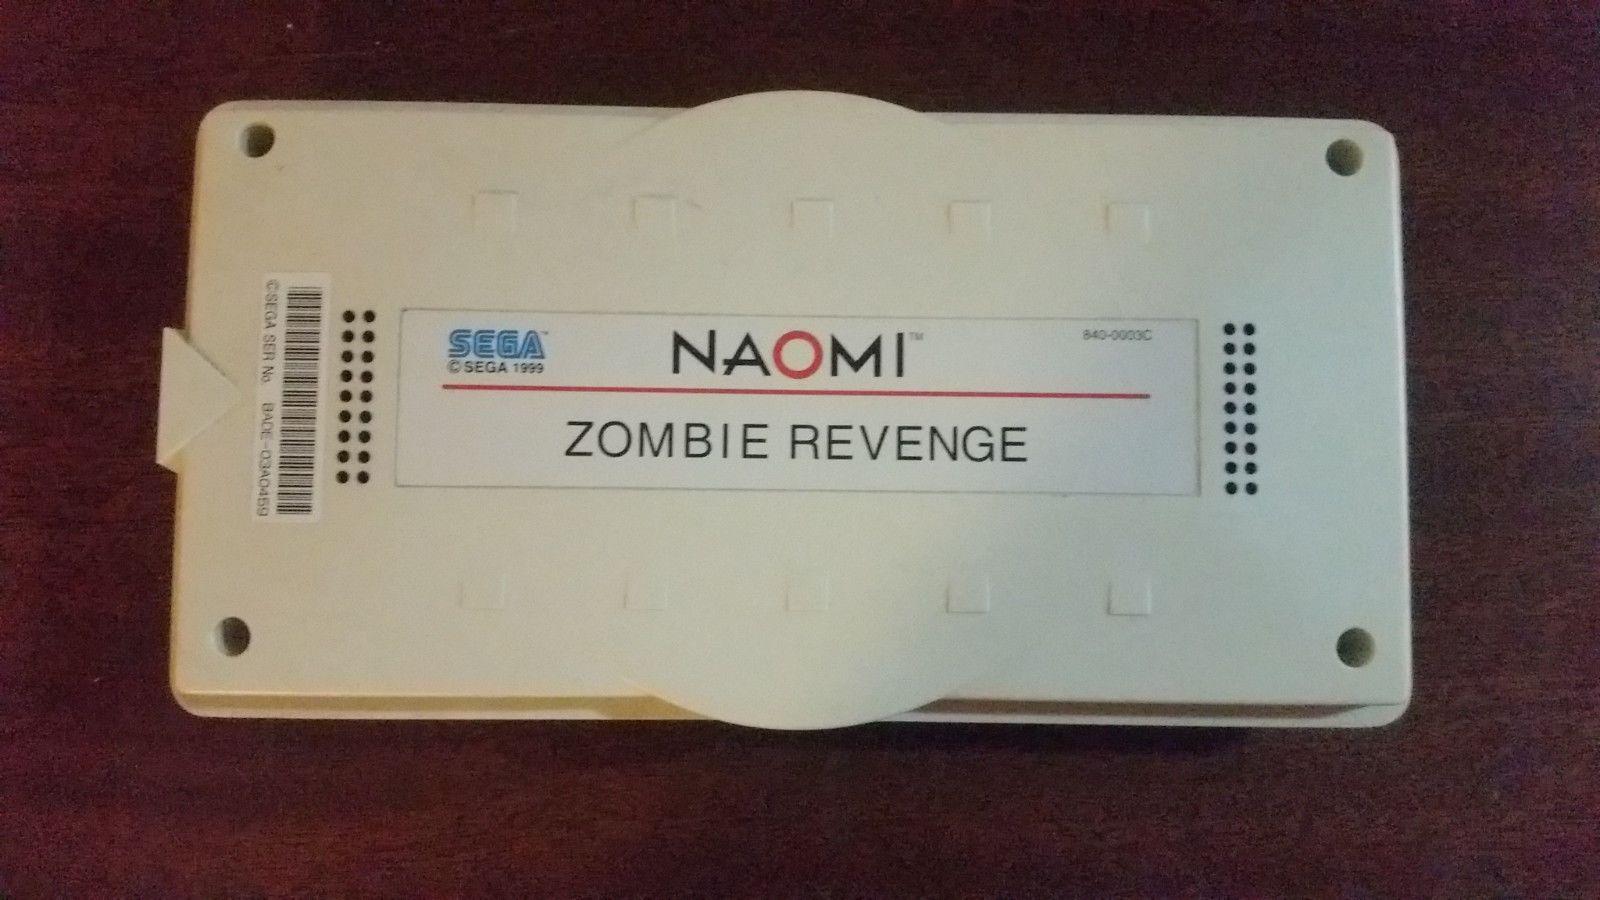 Zombie Revenge Sega Naomi Arcade   vintage games and